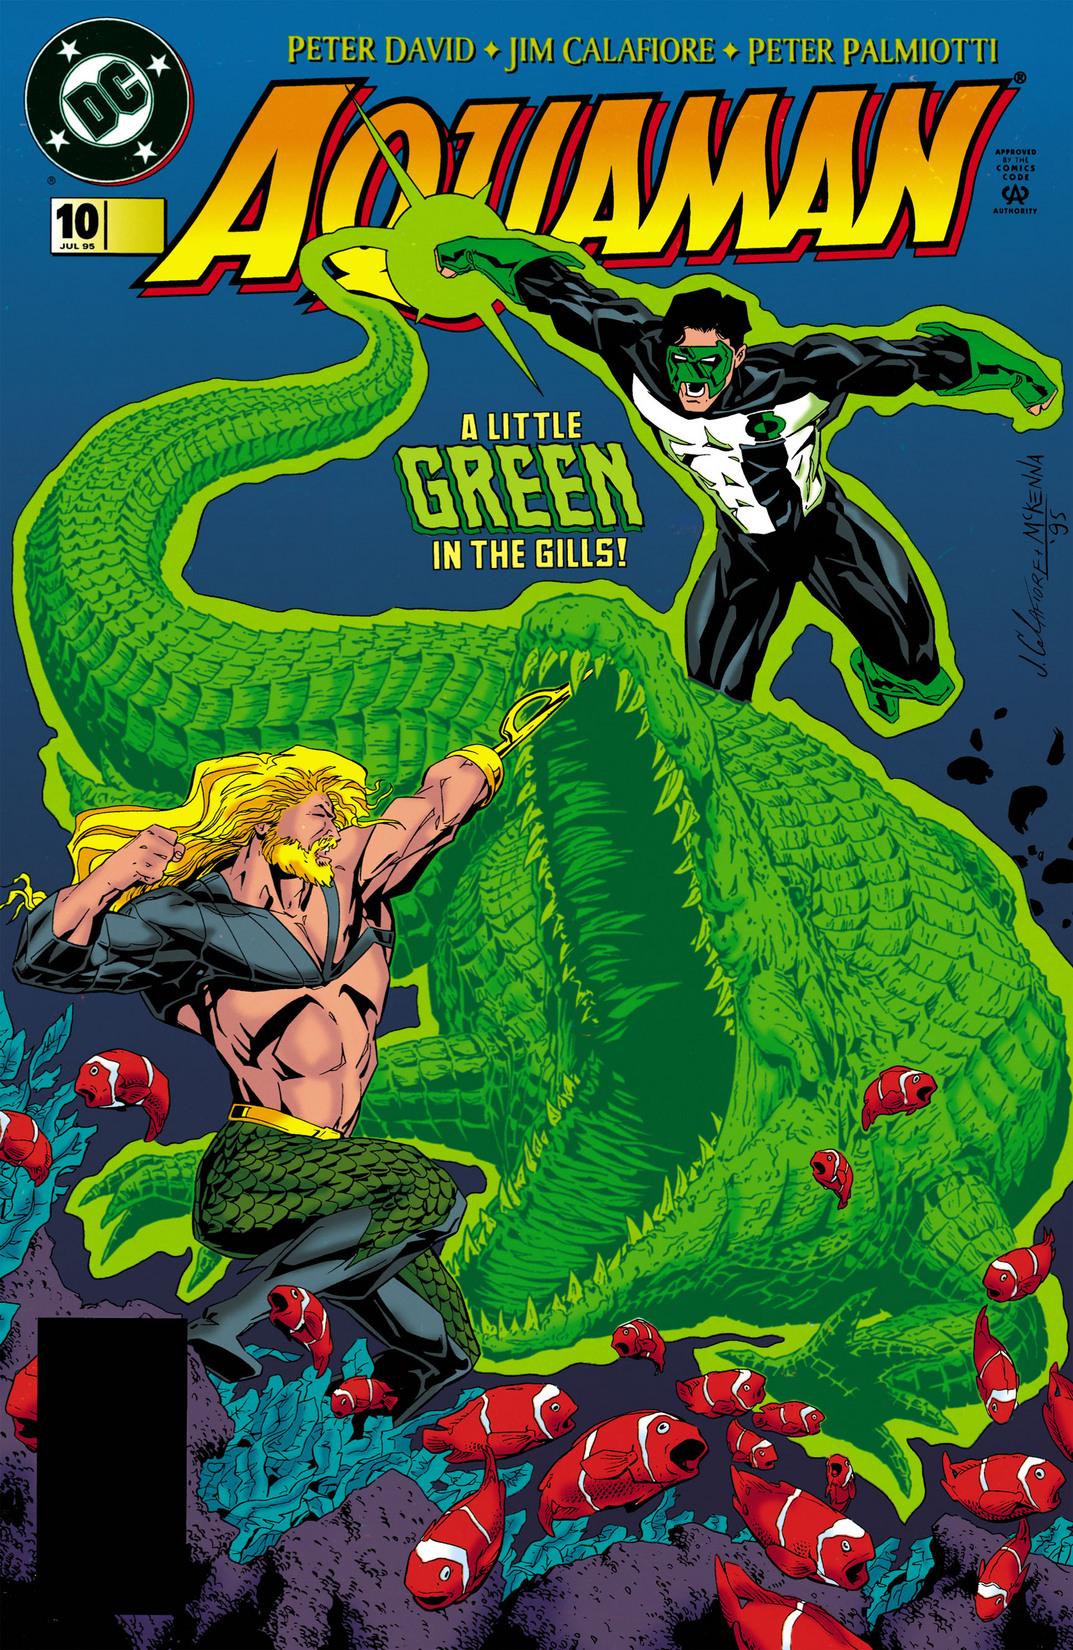 Read online Aquaman (1994) comic -  Issue #10 - 1